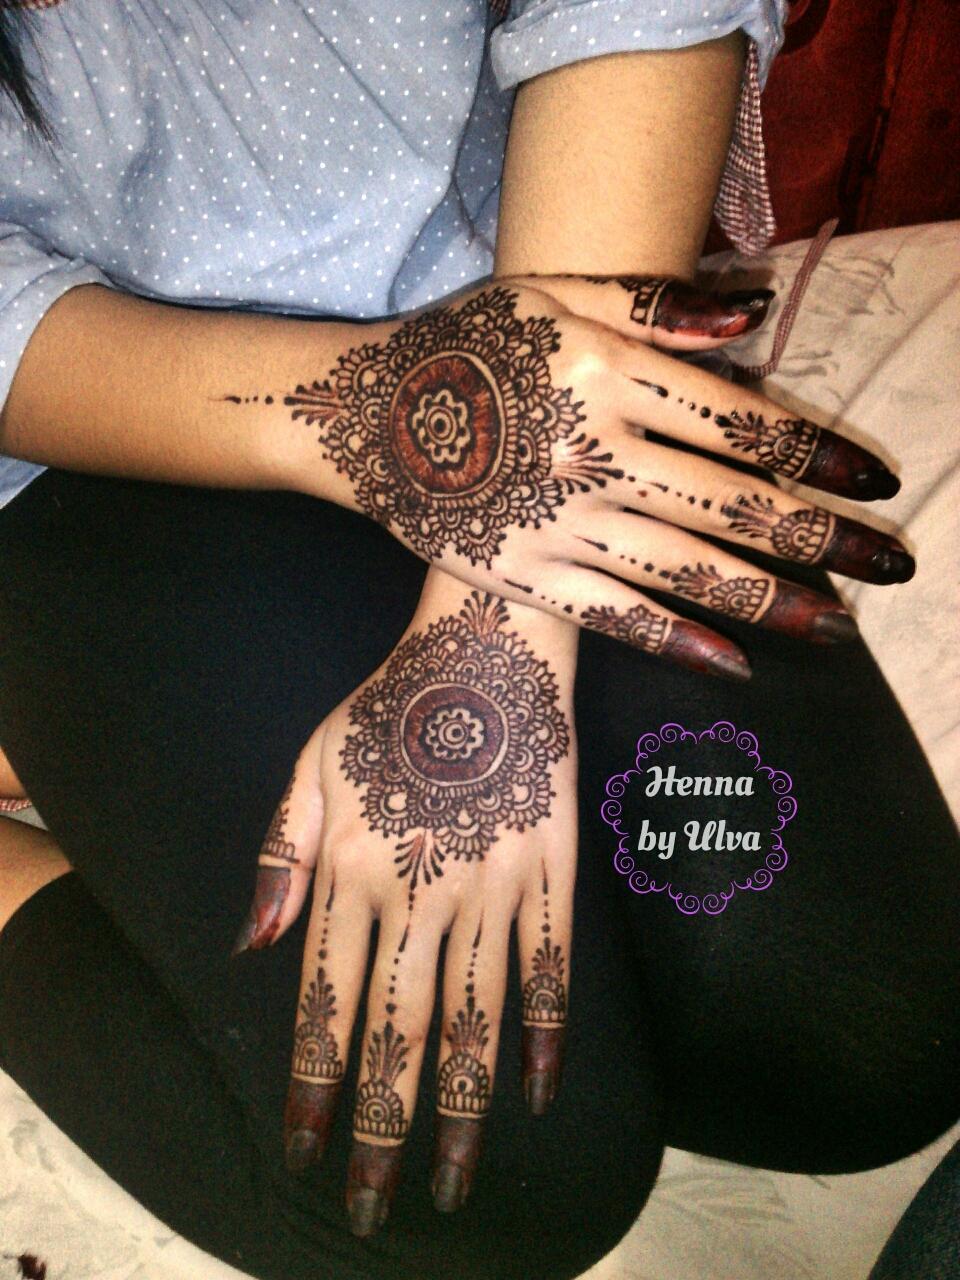 Sistem Infromasi Henna Berbasis Web Pada Alv Henna Pengertian Henna